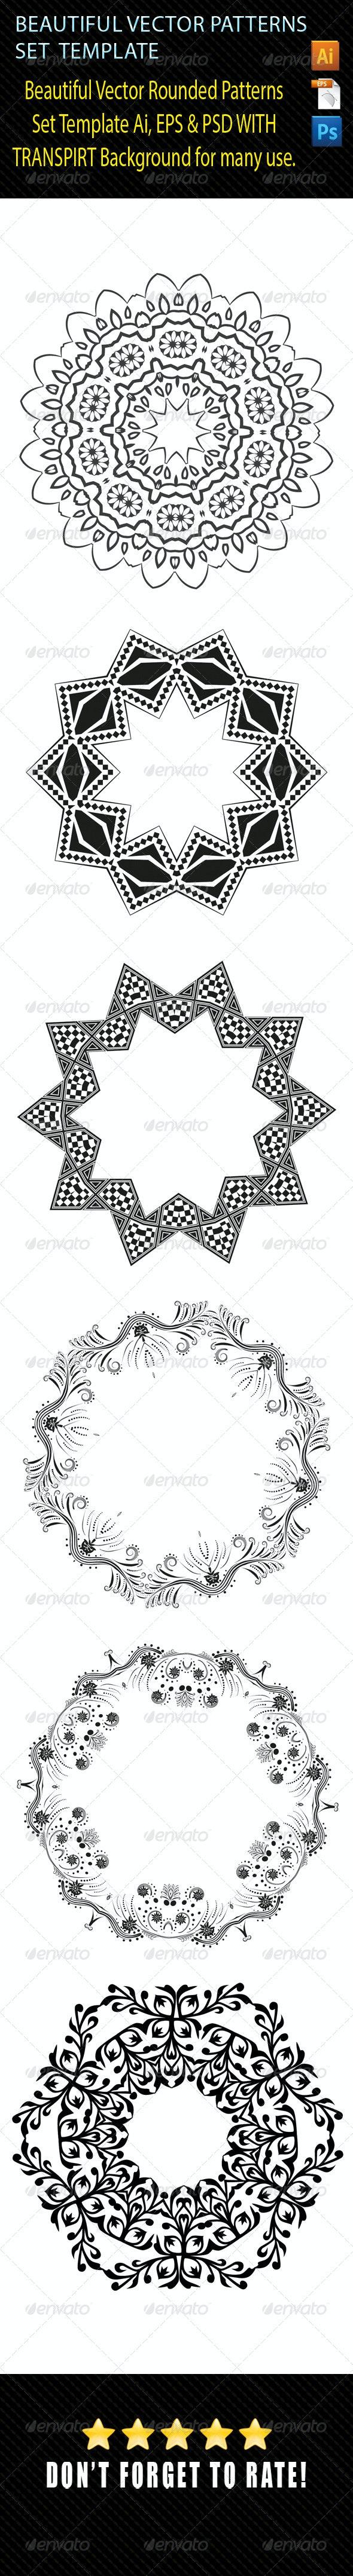 Vector Pattern Set Template 01 - Patterns Decorative